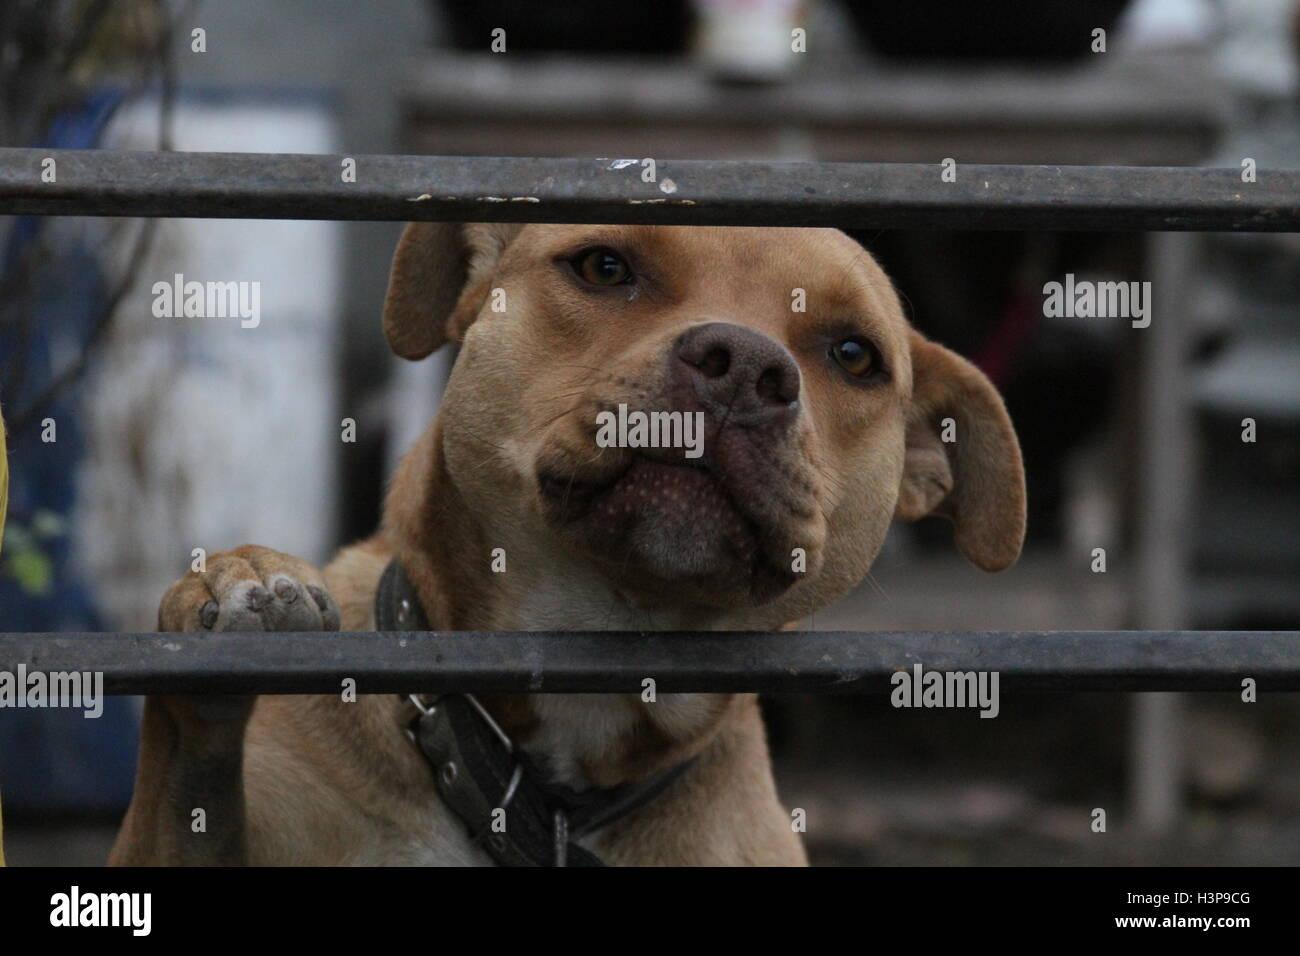 Pictures of a Pitbull in Baja California Mexico, city of rosarito - Stock Image